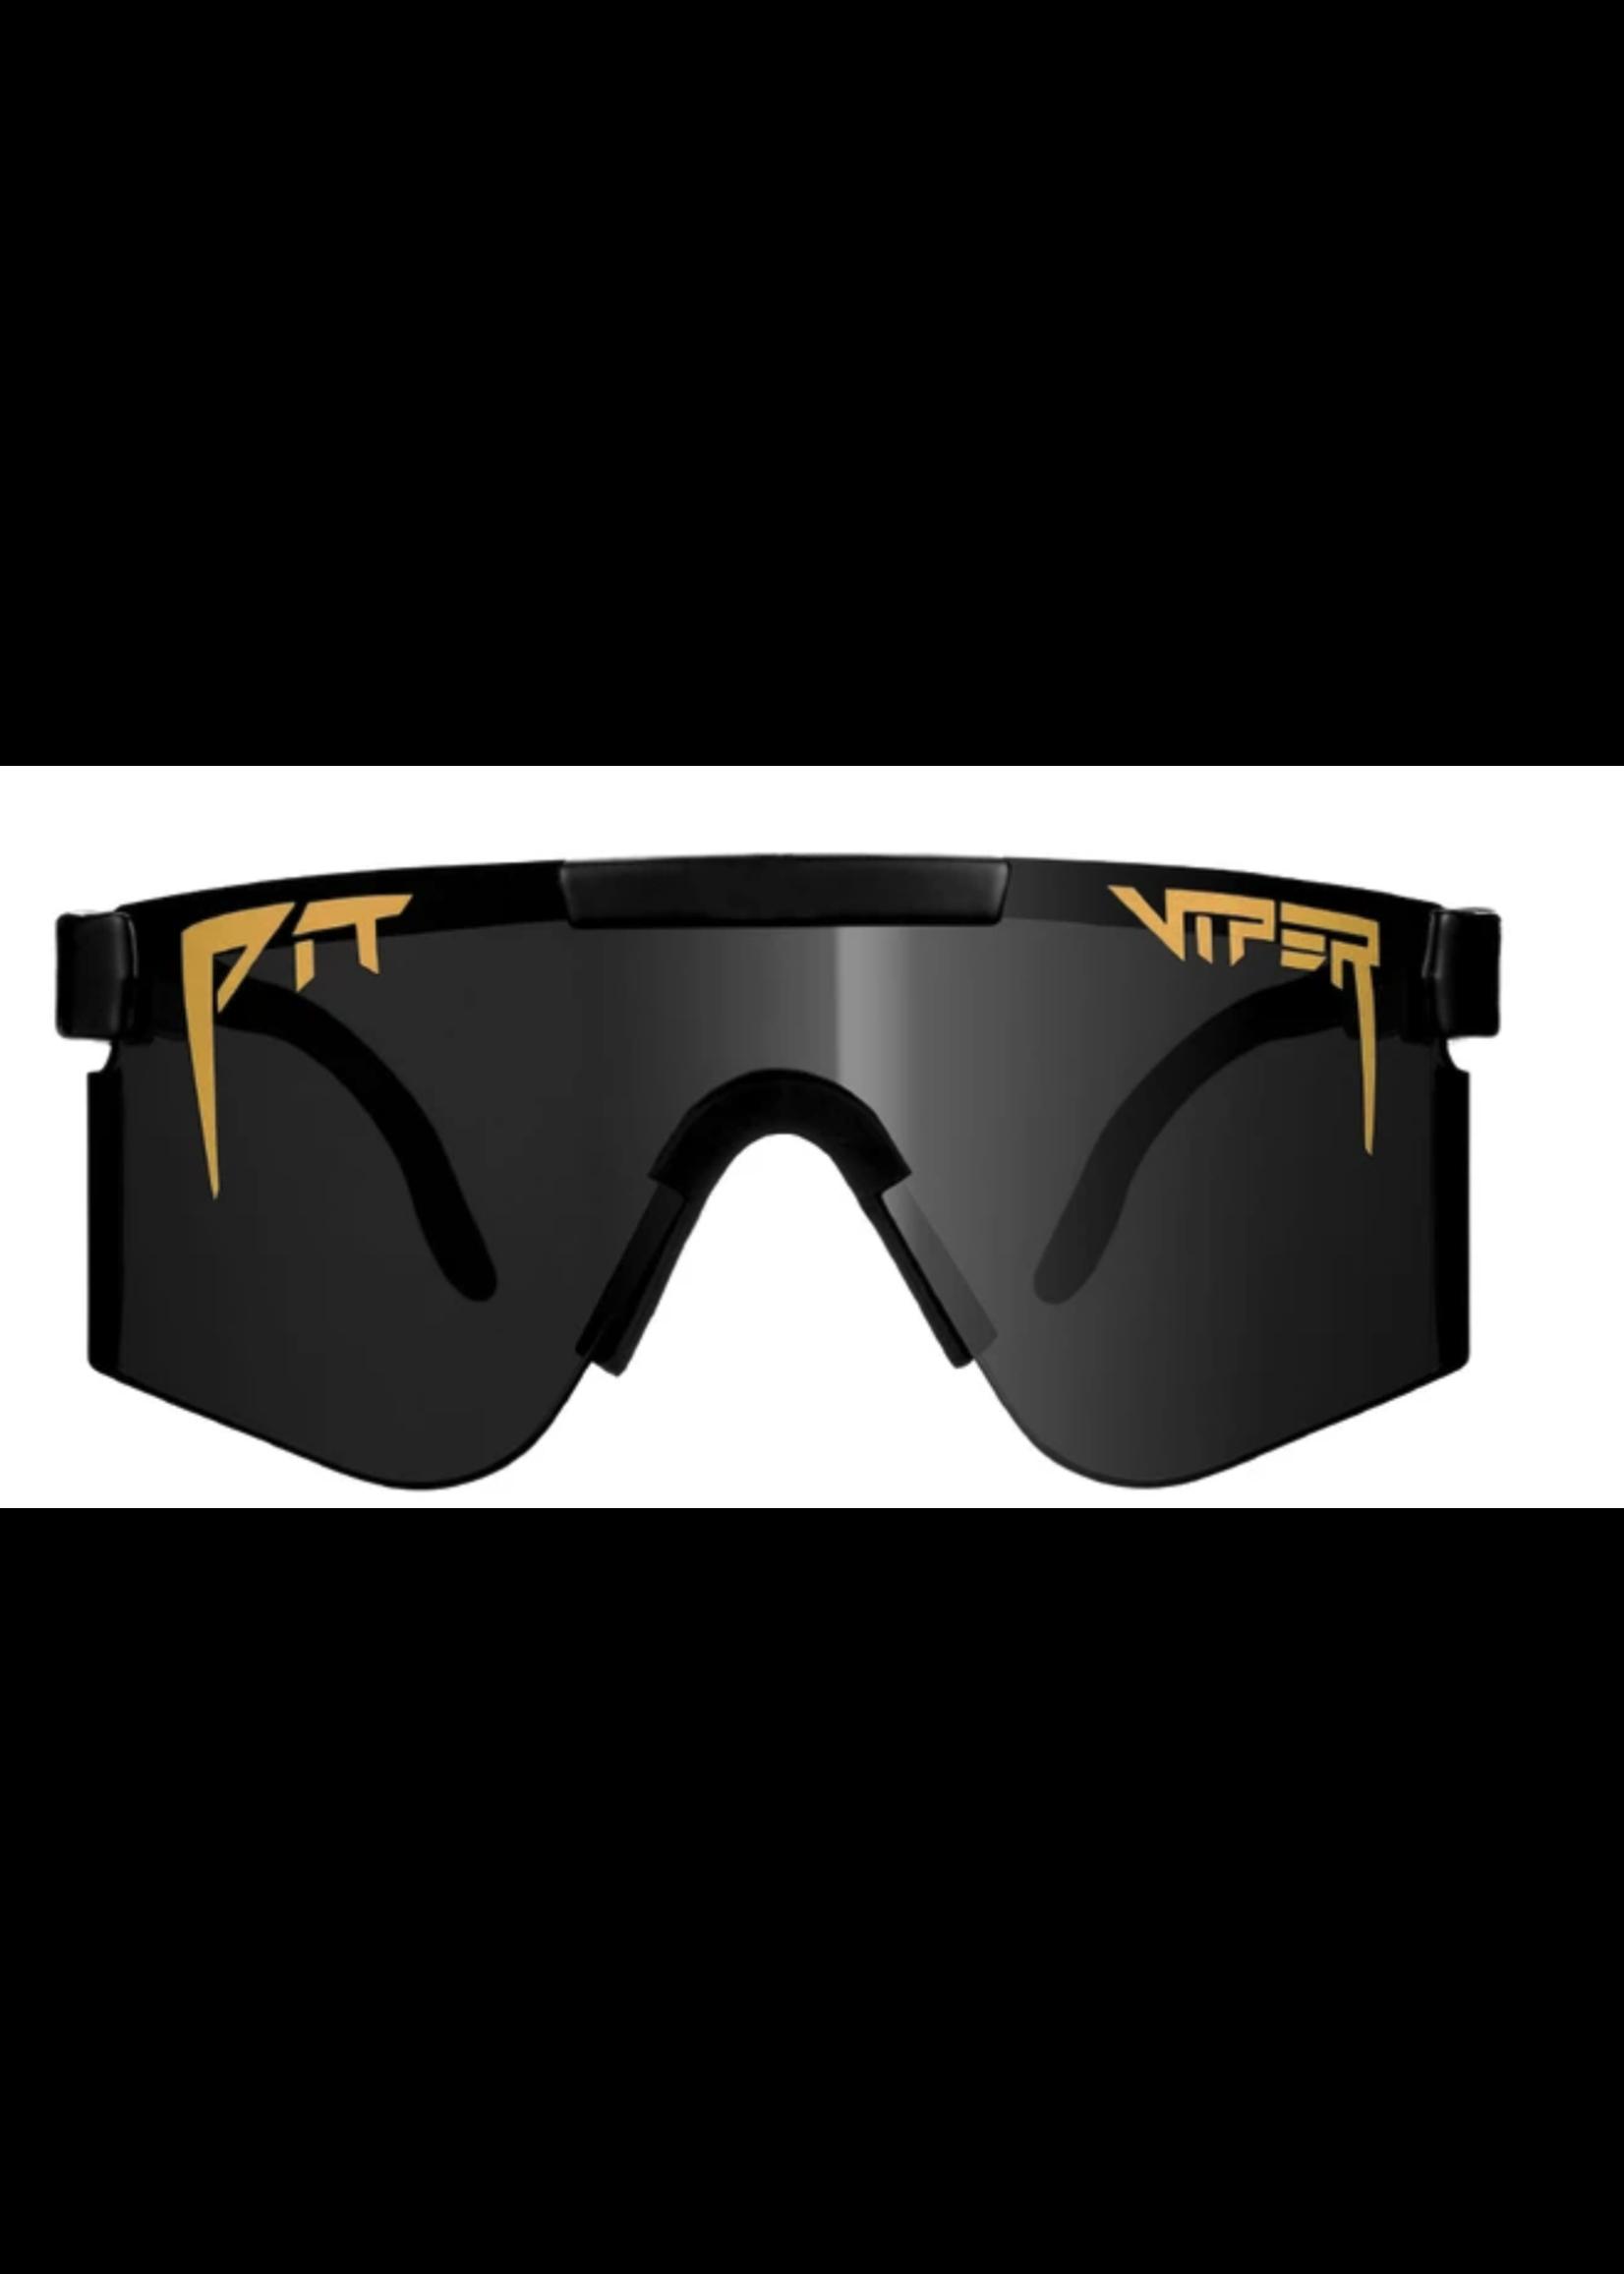 PIT VIPER Pit Viper Original